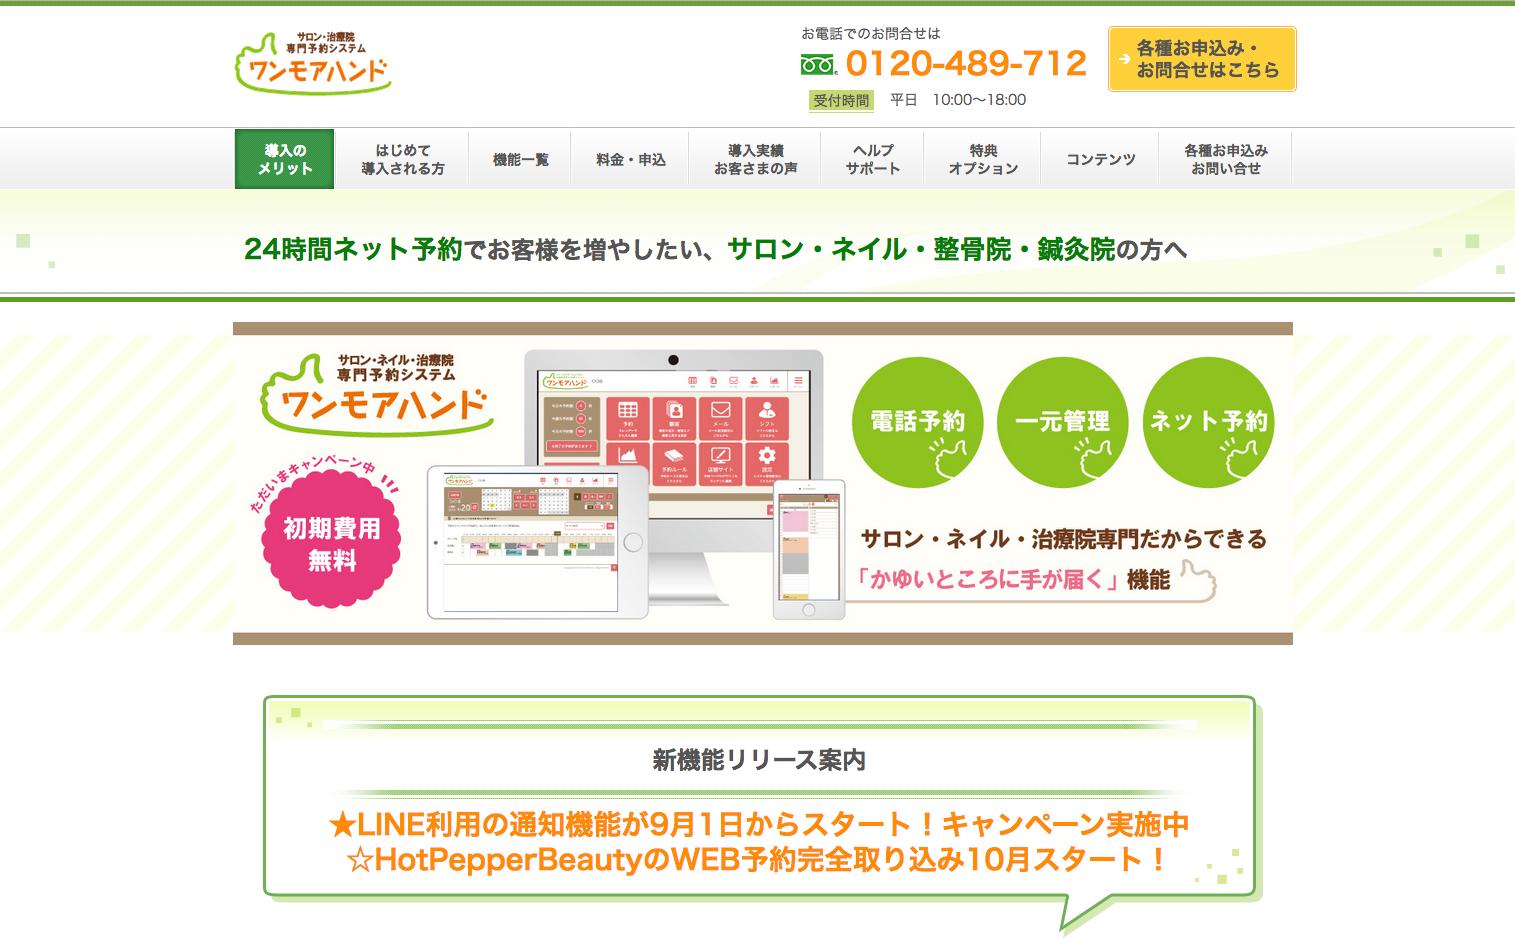 BRIDGE_DESIGN ブリッジ 美容室 美容院 大阪 集客 コンサル 広告 求人 失敗 廃業 成功率 独立 開業